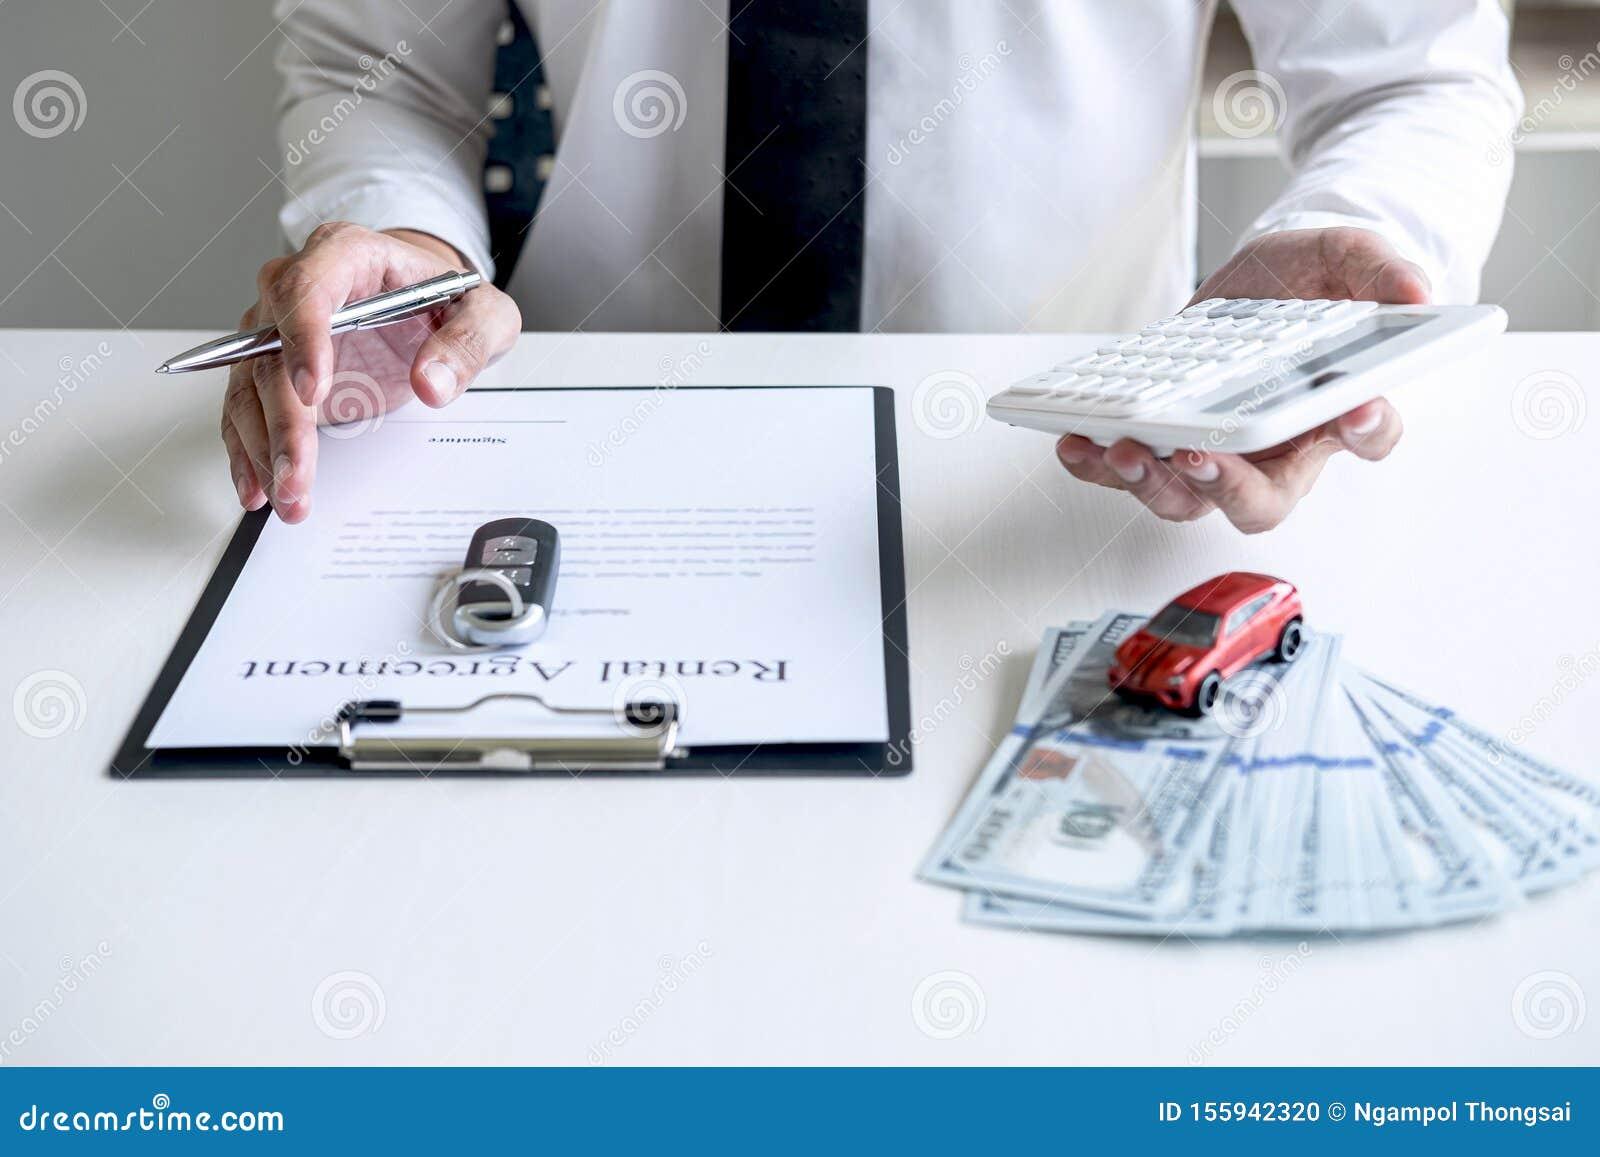 Man Client Calculating Insurance Premium For Decide ...